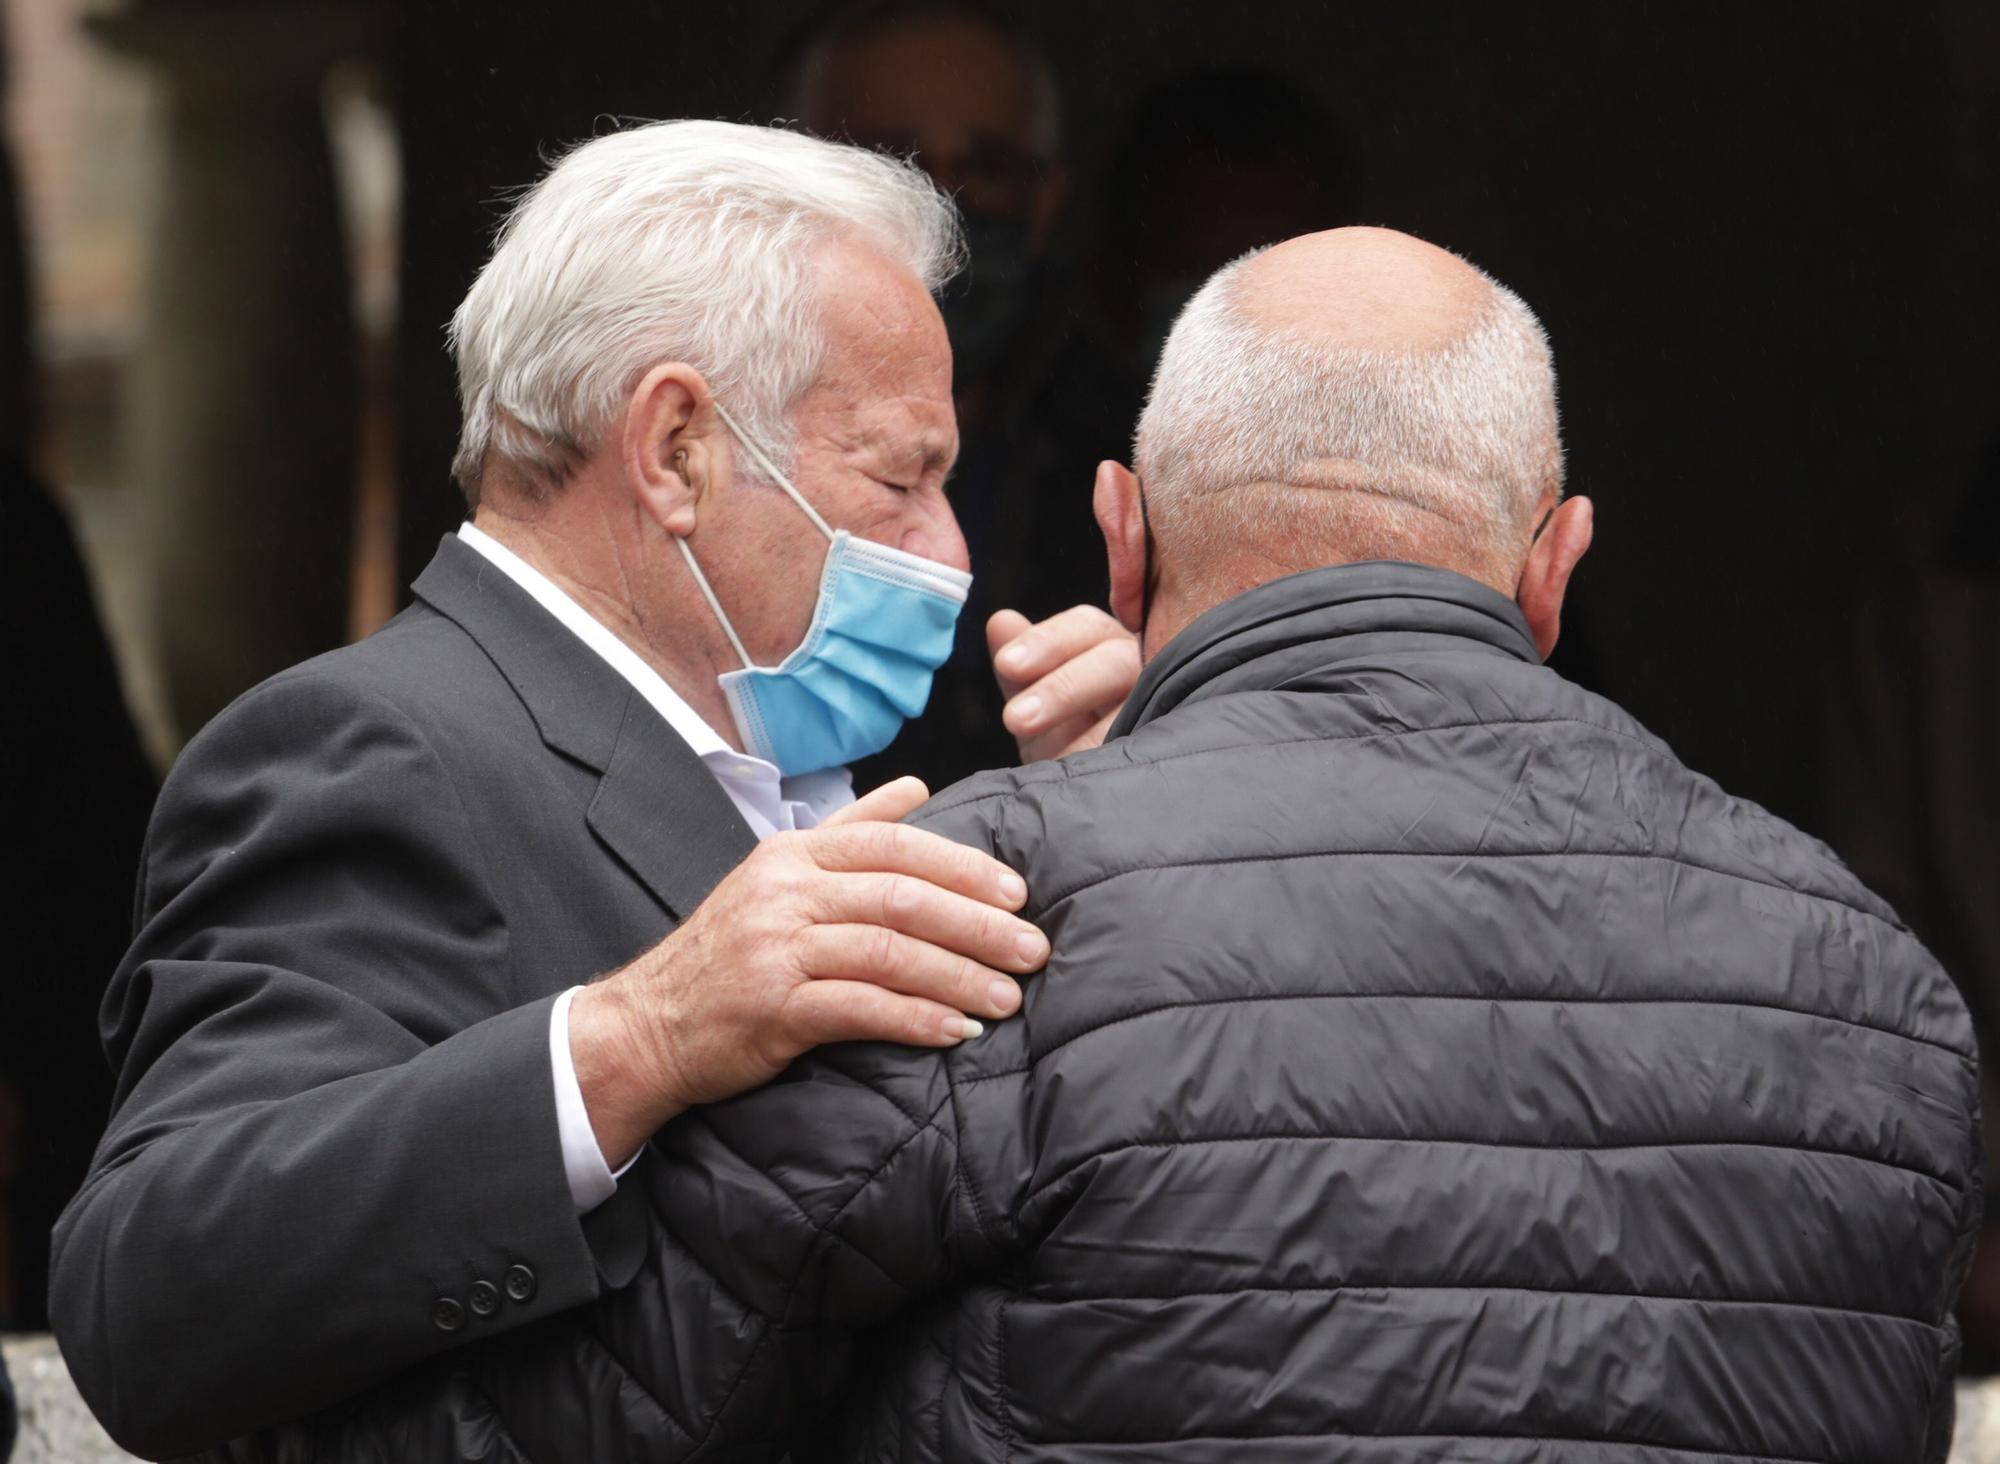 Emotivo funeral por Teresa Aladro, asesinada en Laviana por su exmarido